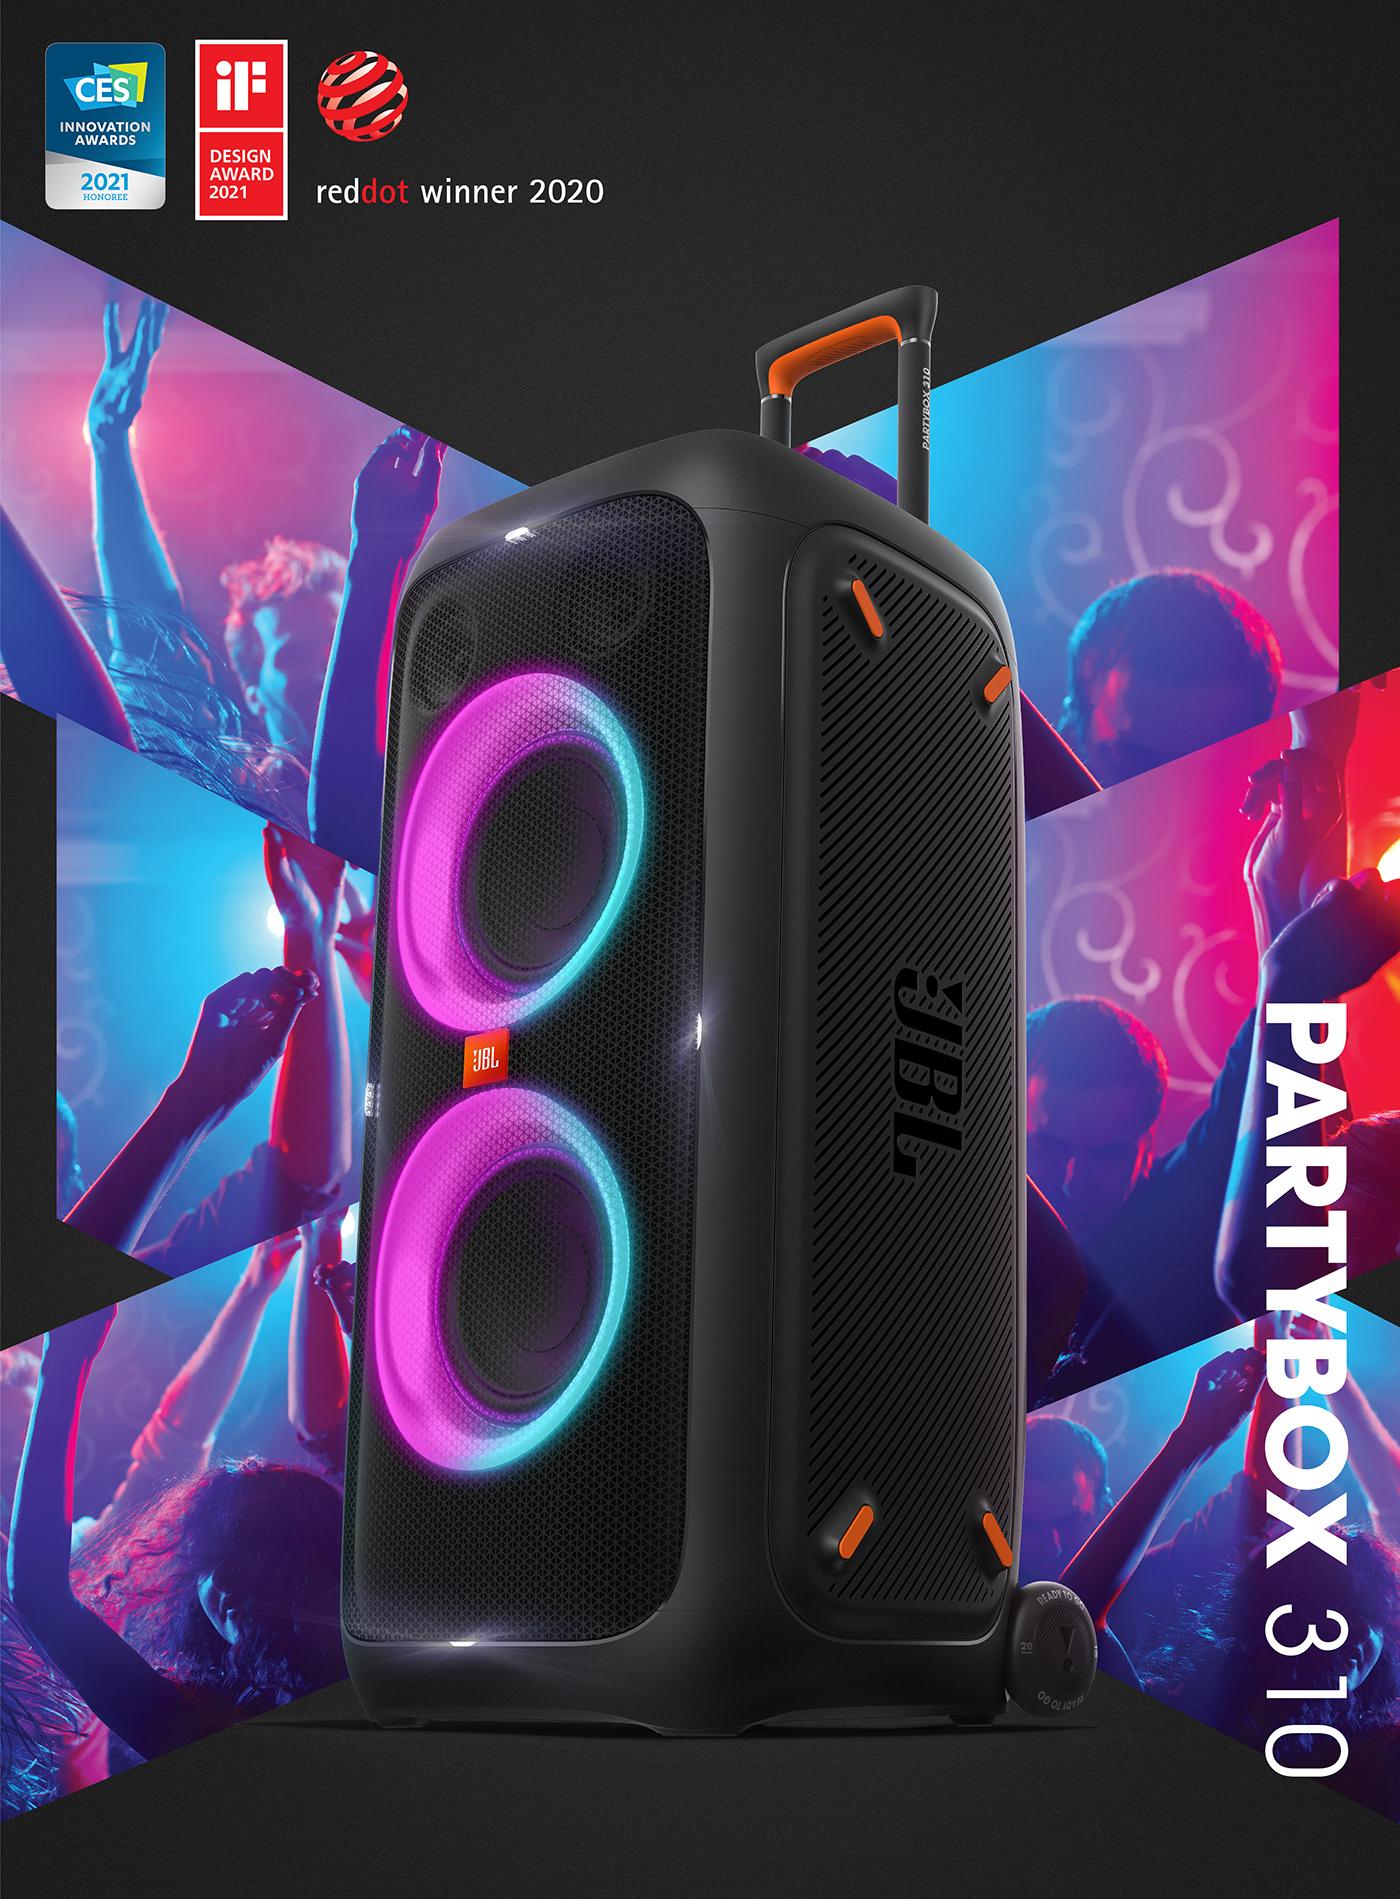 Audio bluetooth Harman industrial design  jbl music party partybox portable speaker